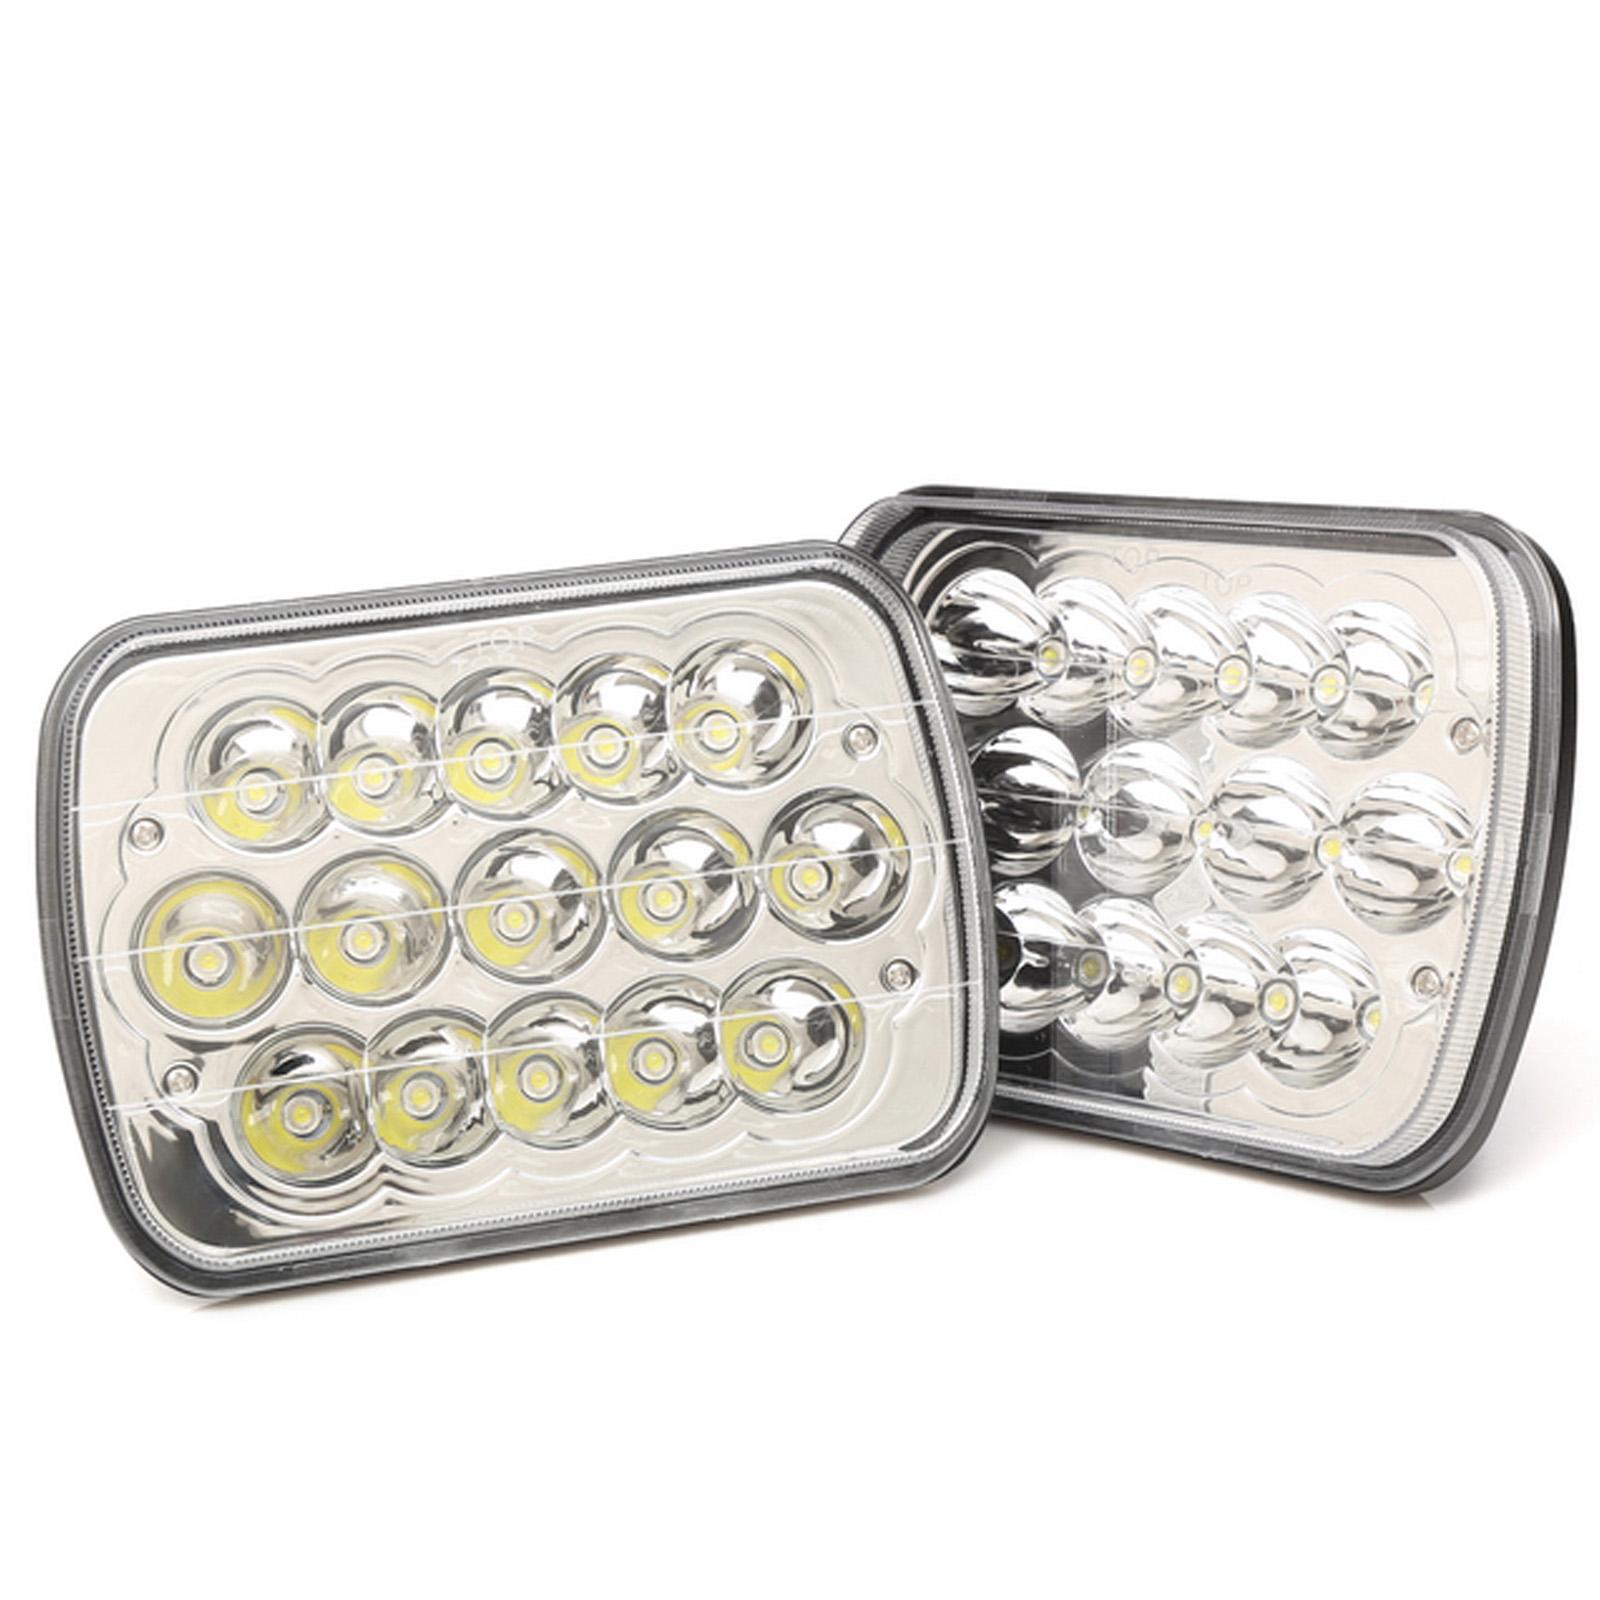 "Qty2 7/""X6/'/' LED Headlight Hi Lo Beam For Chevy Express Cargo Van 1500 2500 3500"